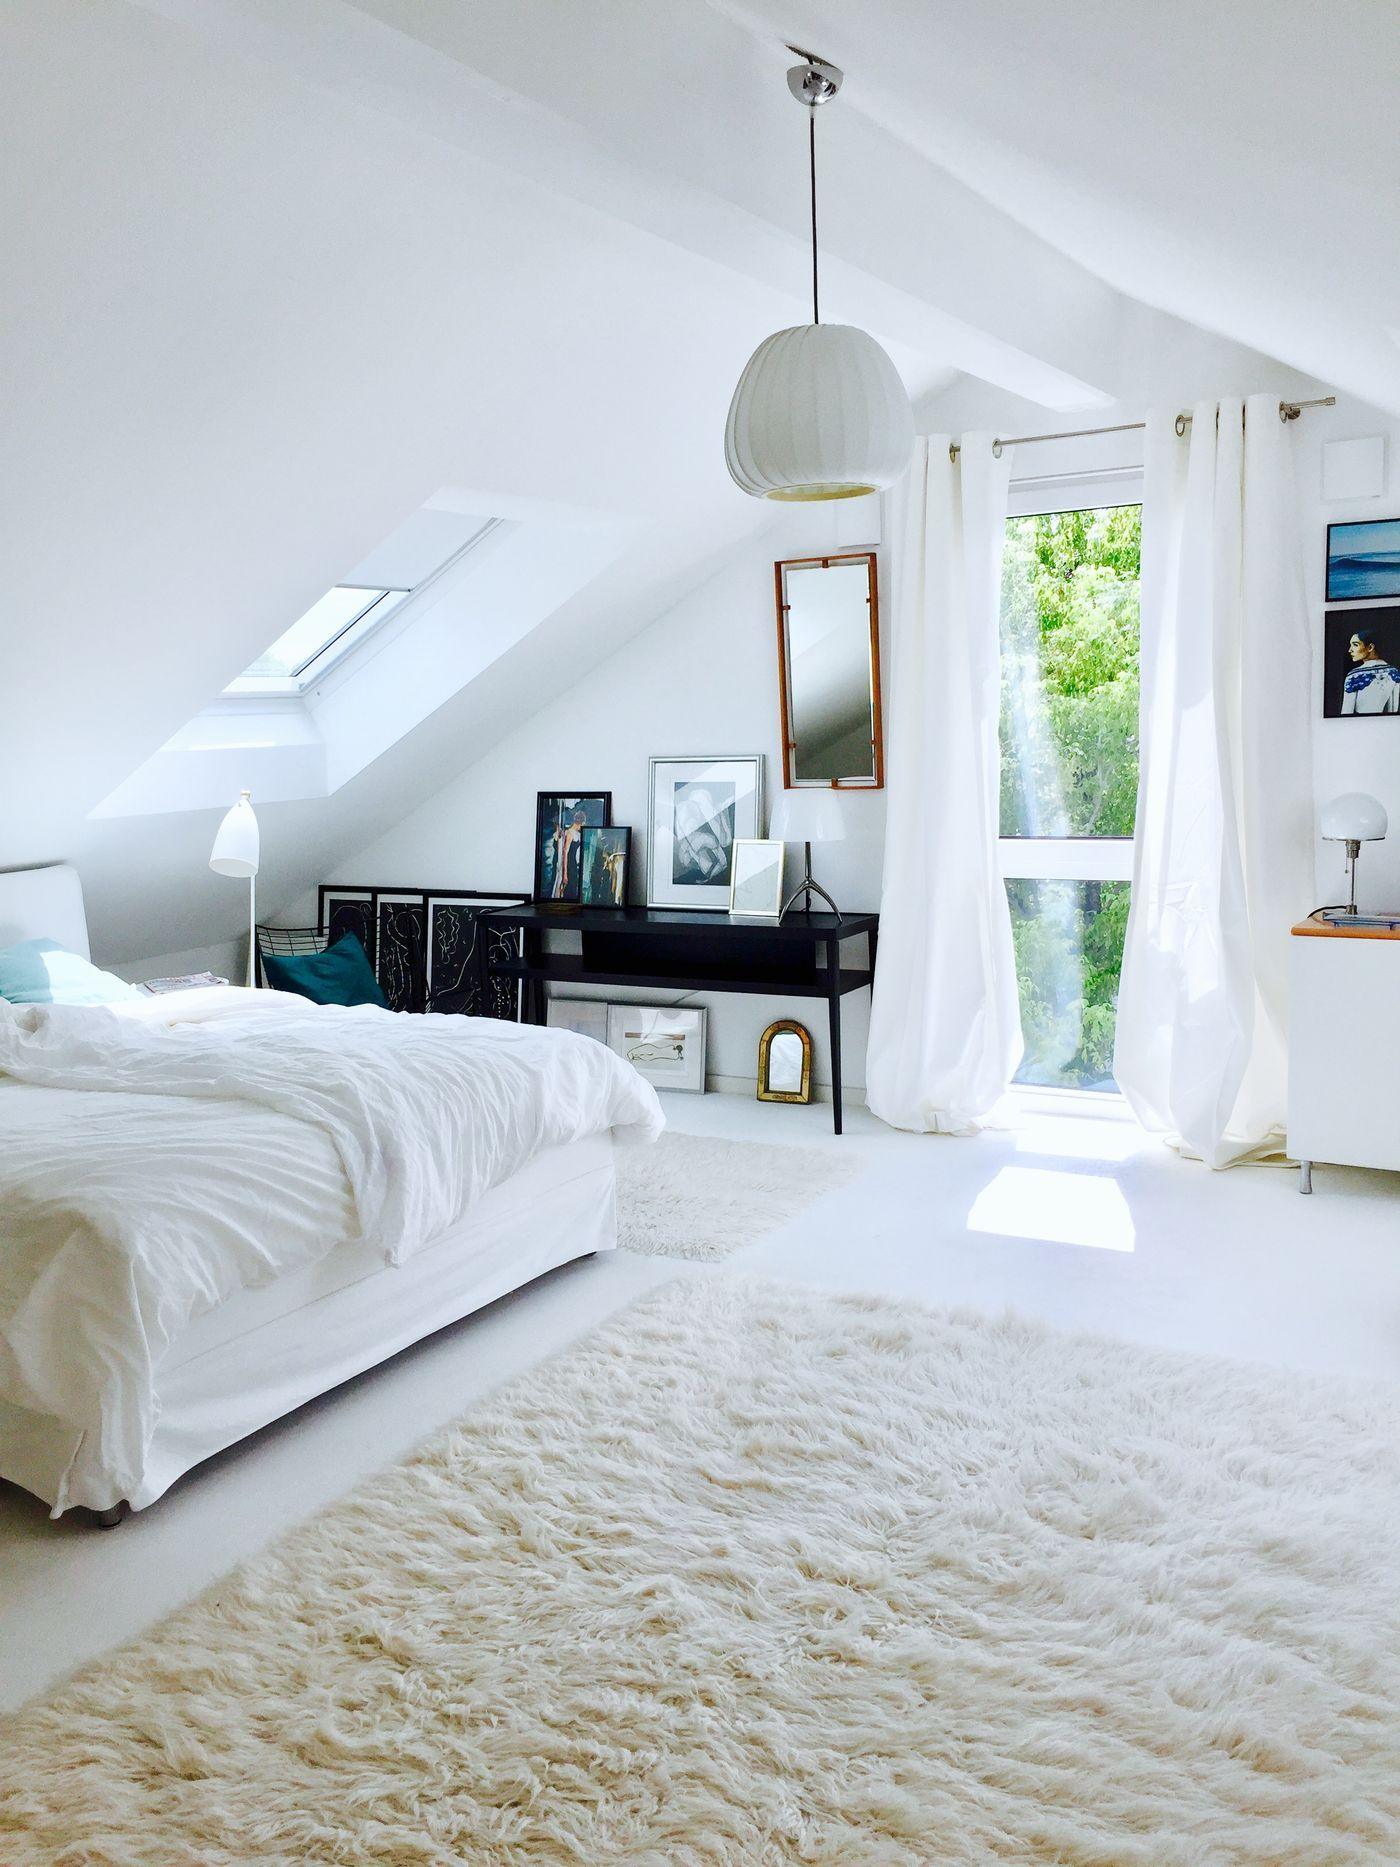 schlafzimmer petrol gestalten 140 bett 1 oder 2 lattenroste antikes schlafzimmer komplett. Black Bedroom Furniture Sets. Home Design Ideas